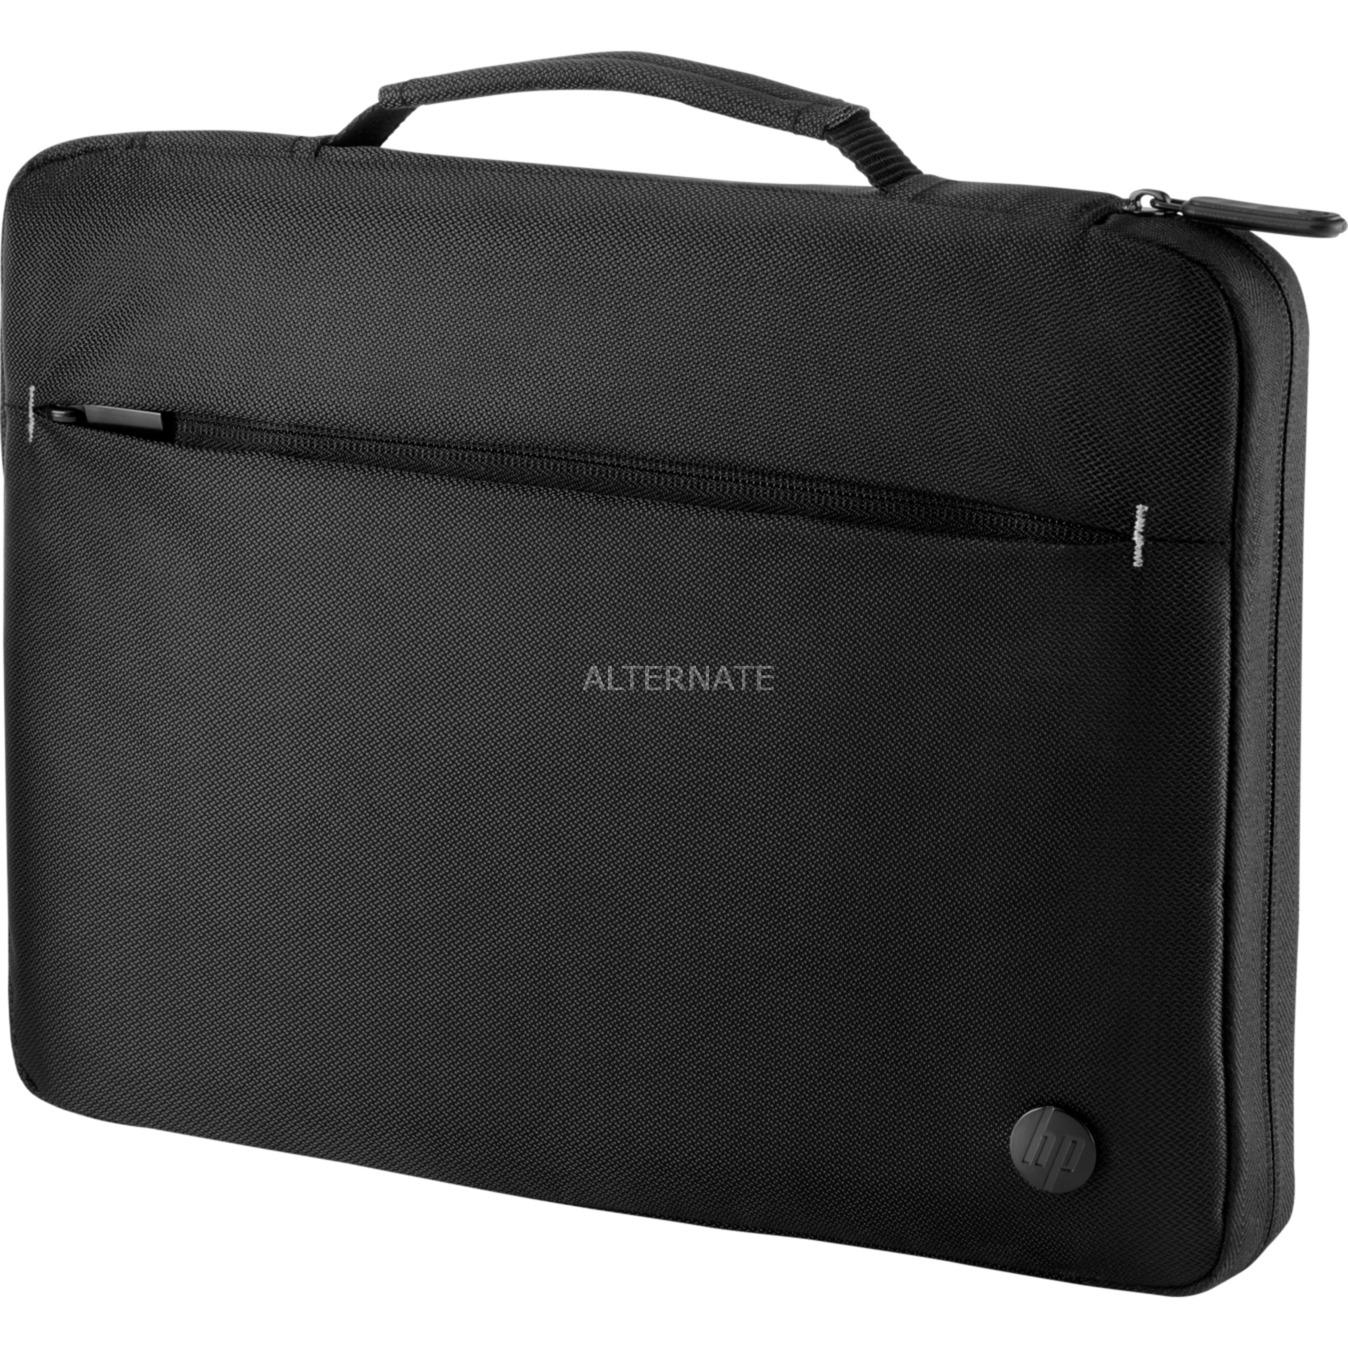 "13.3 Business Sleeve maletines para portátil 33,8 cm (13.3"") Funda Negro, Bolsa"